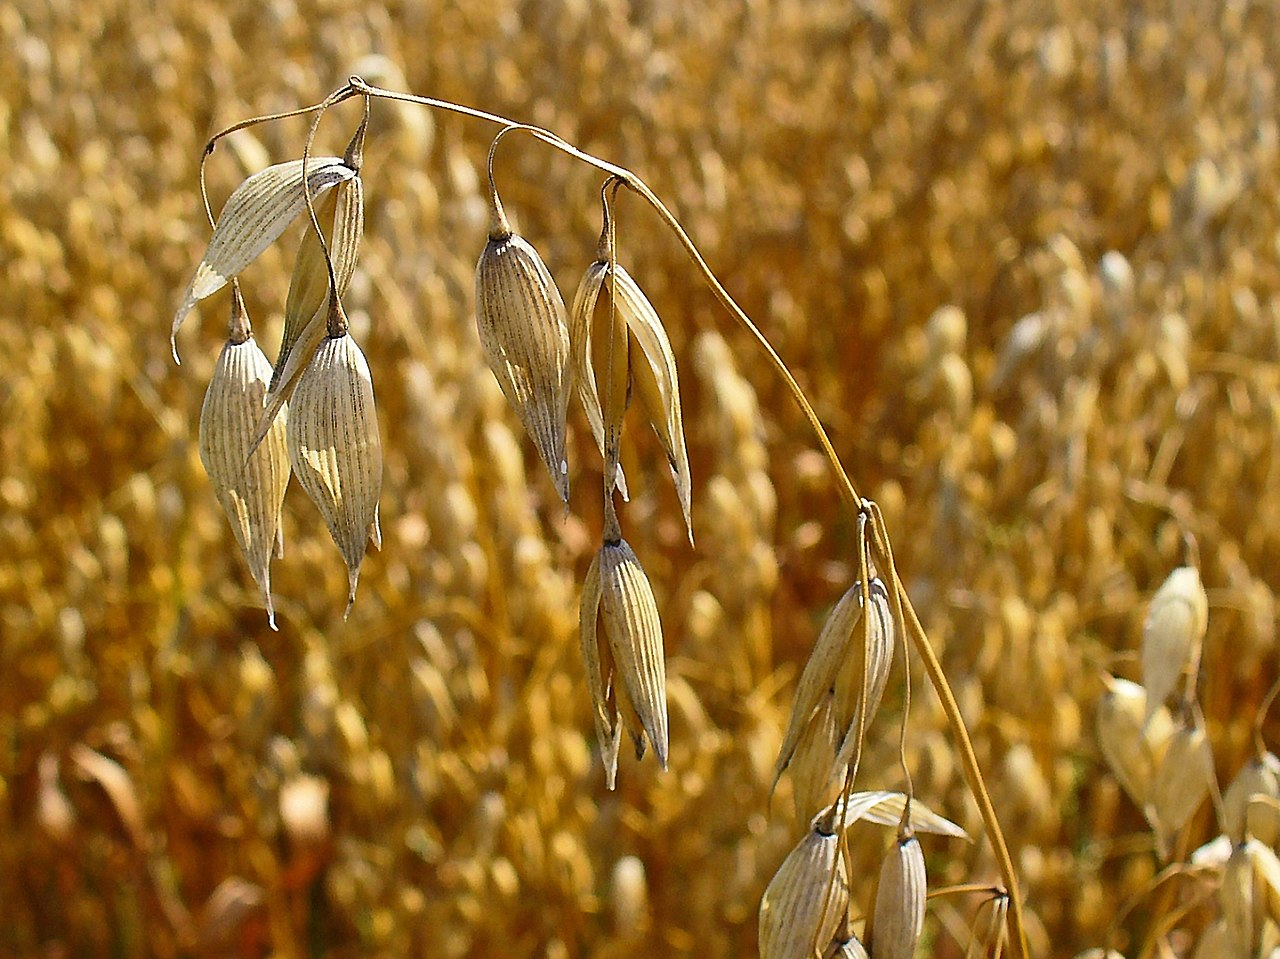 Vete råg korn